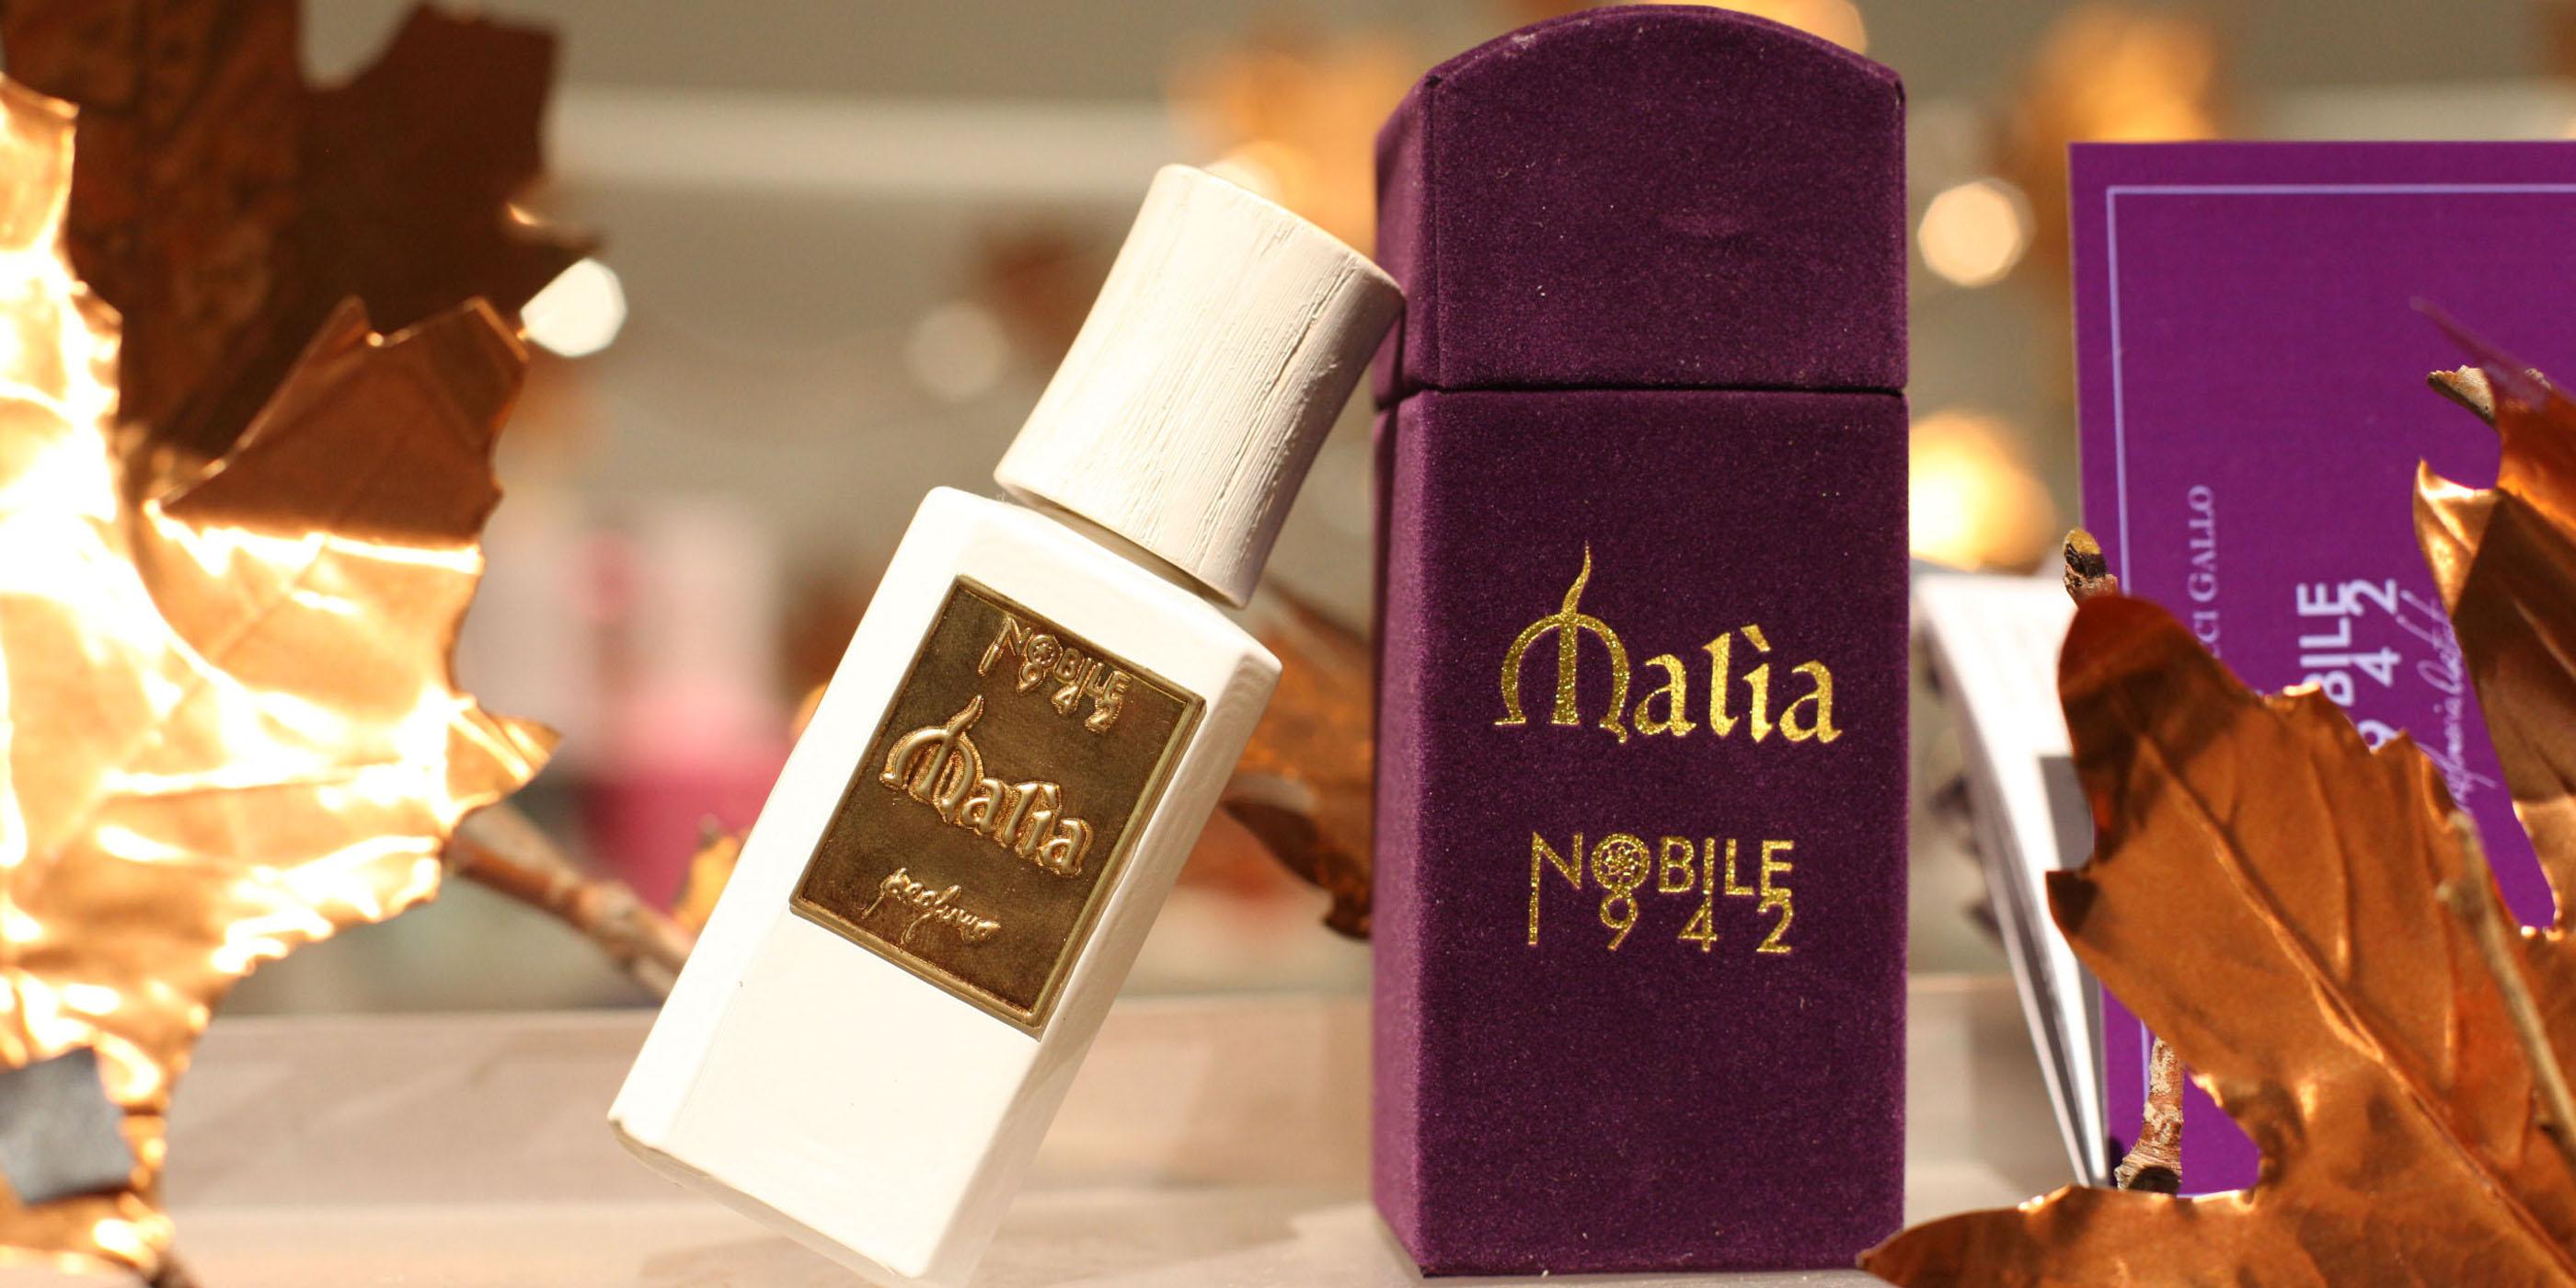 Nobile1942 New perfume Malia